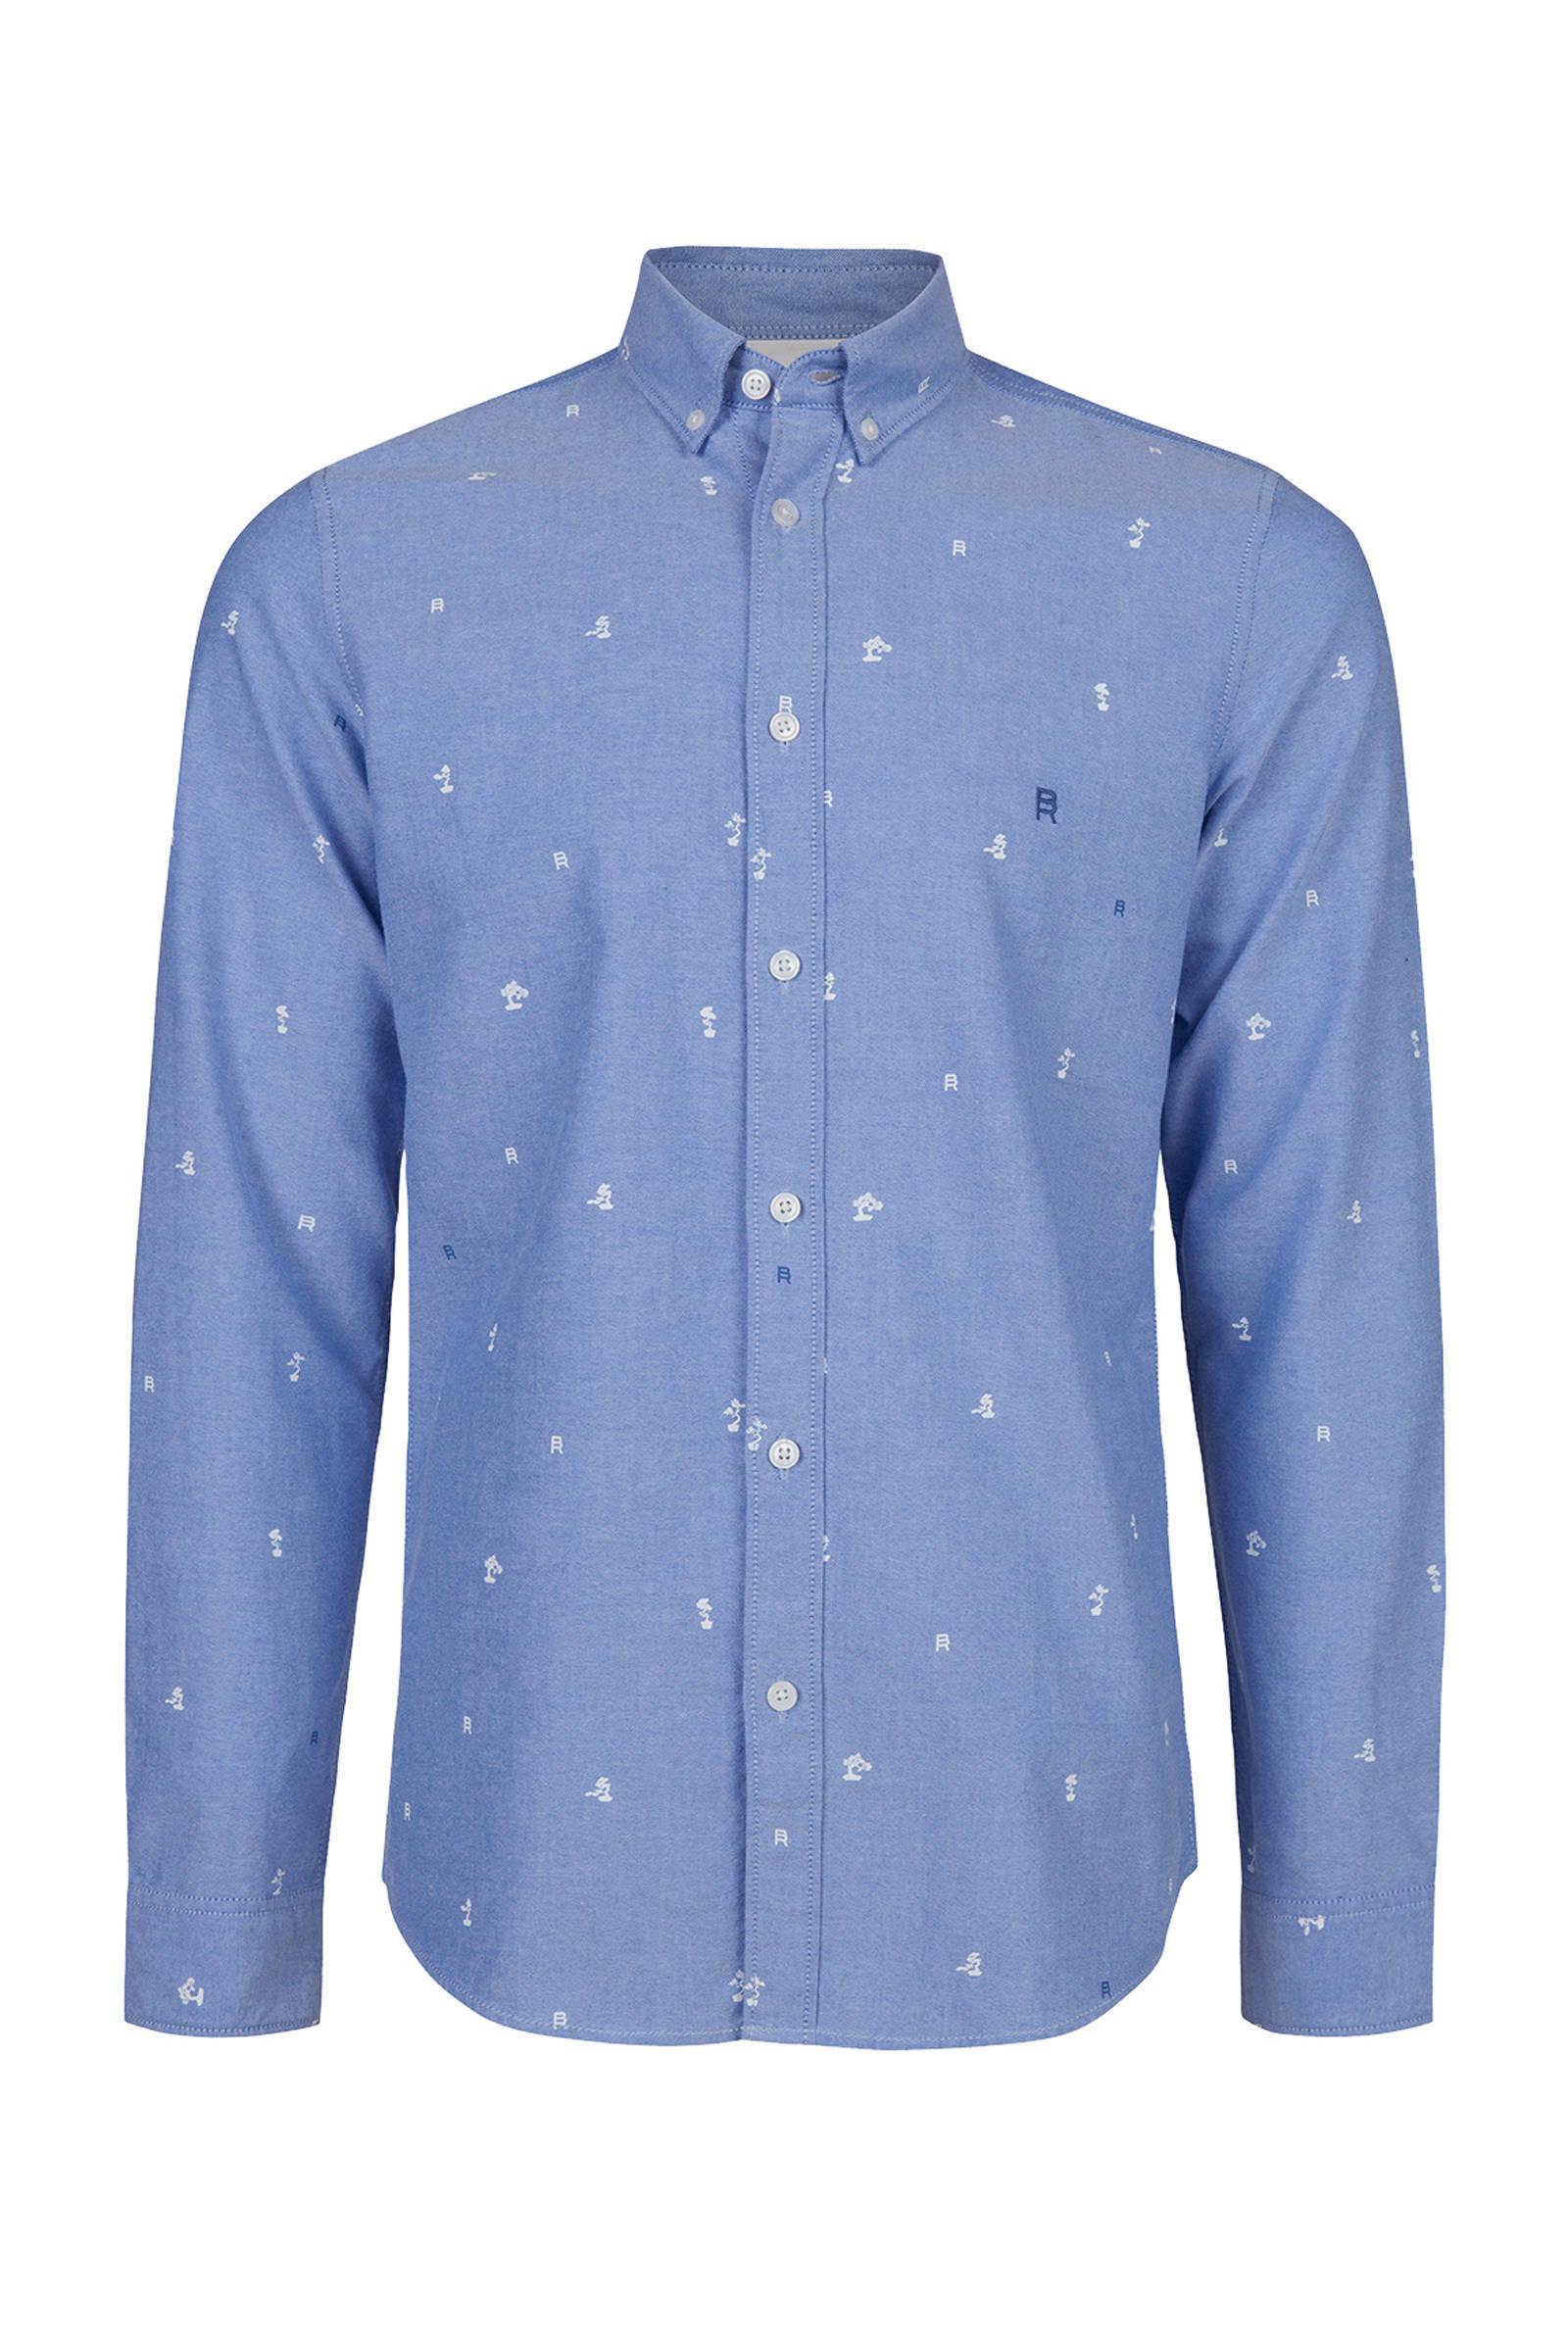 Overhemd Print.Blue Ridge Slim Fit Overhemd Met All Over Print